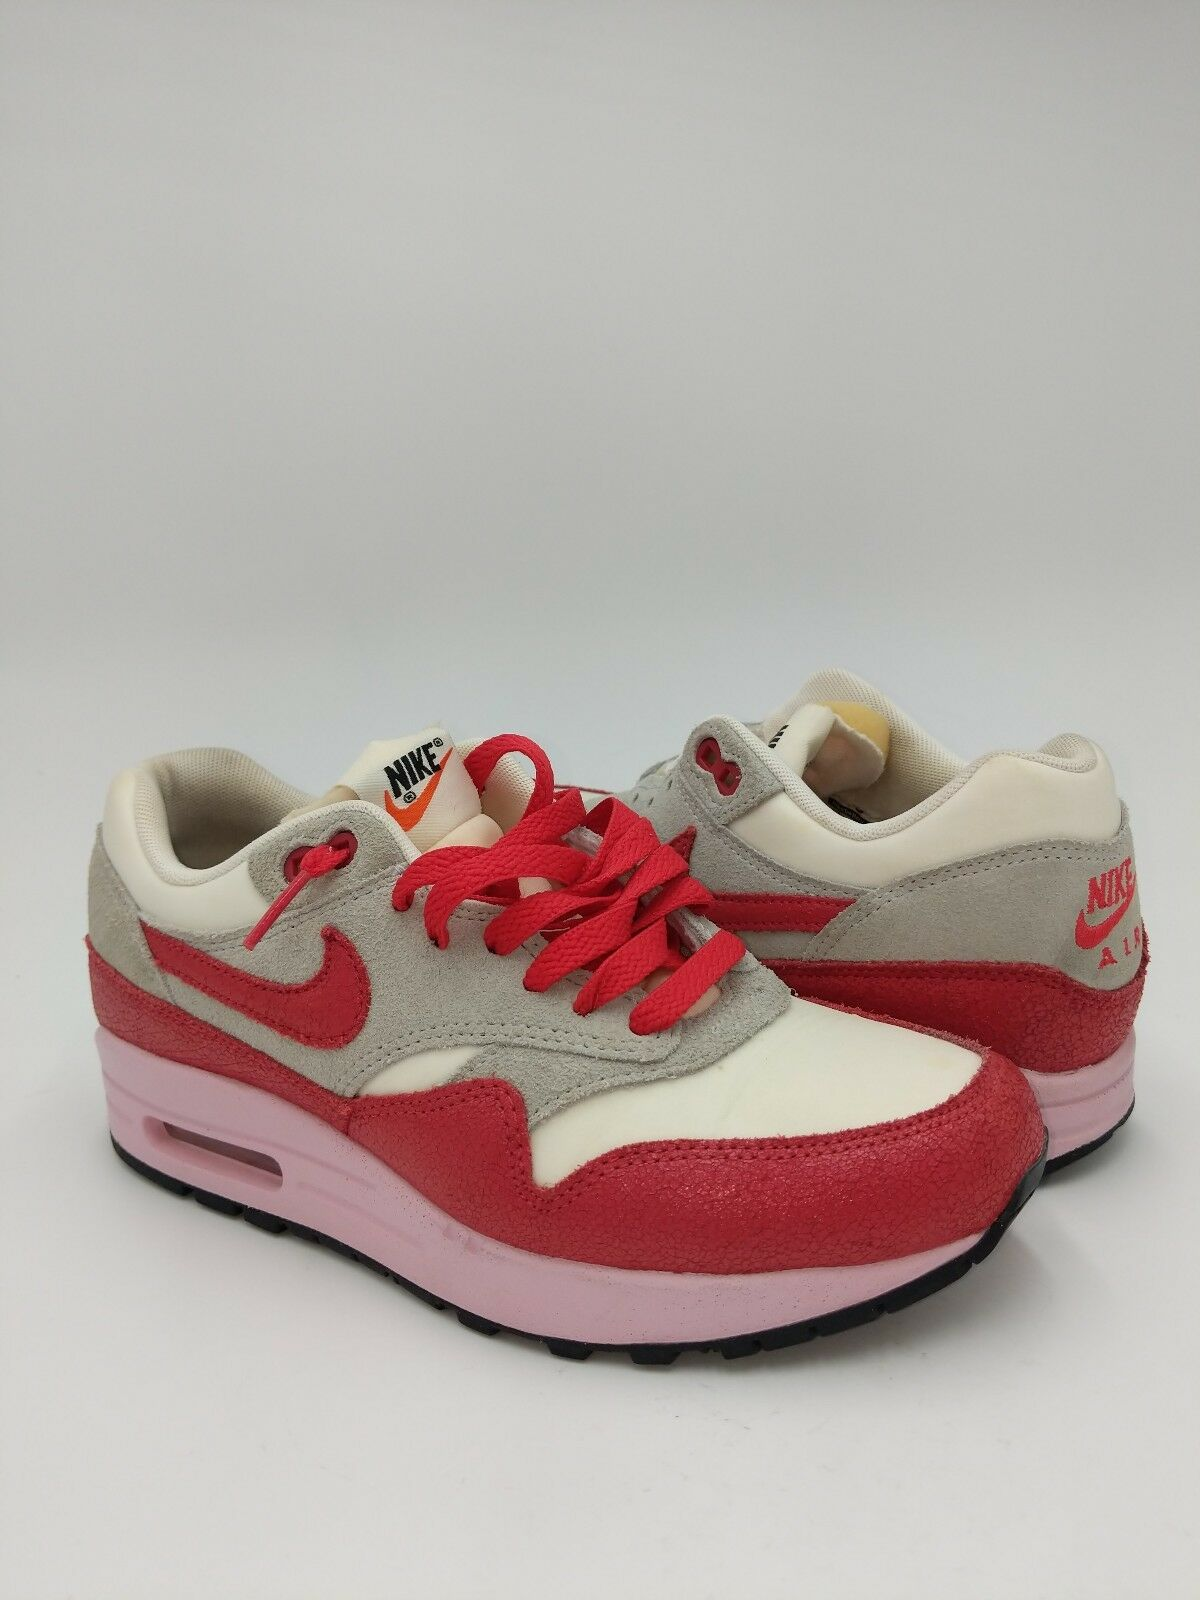 Nike WMNS Air Mas 1 VNTG - 555284 103 Size 6.5